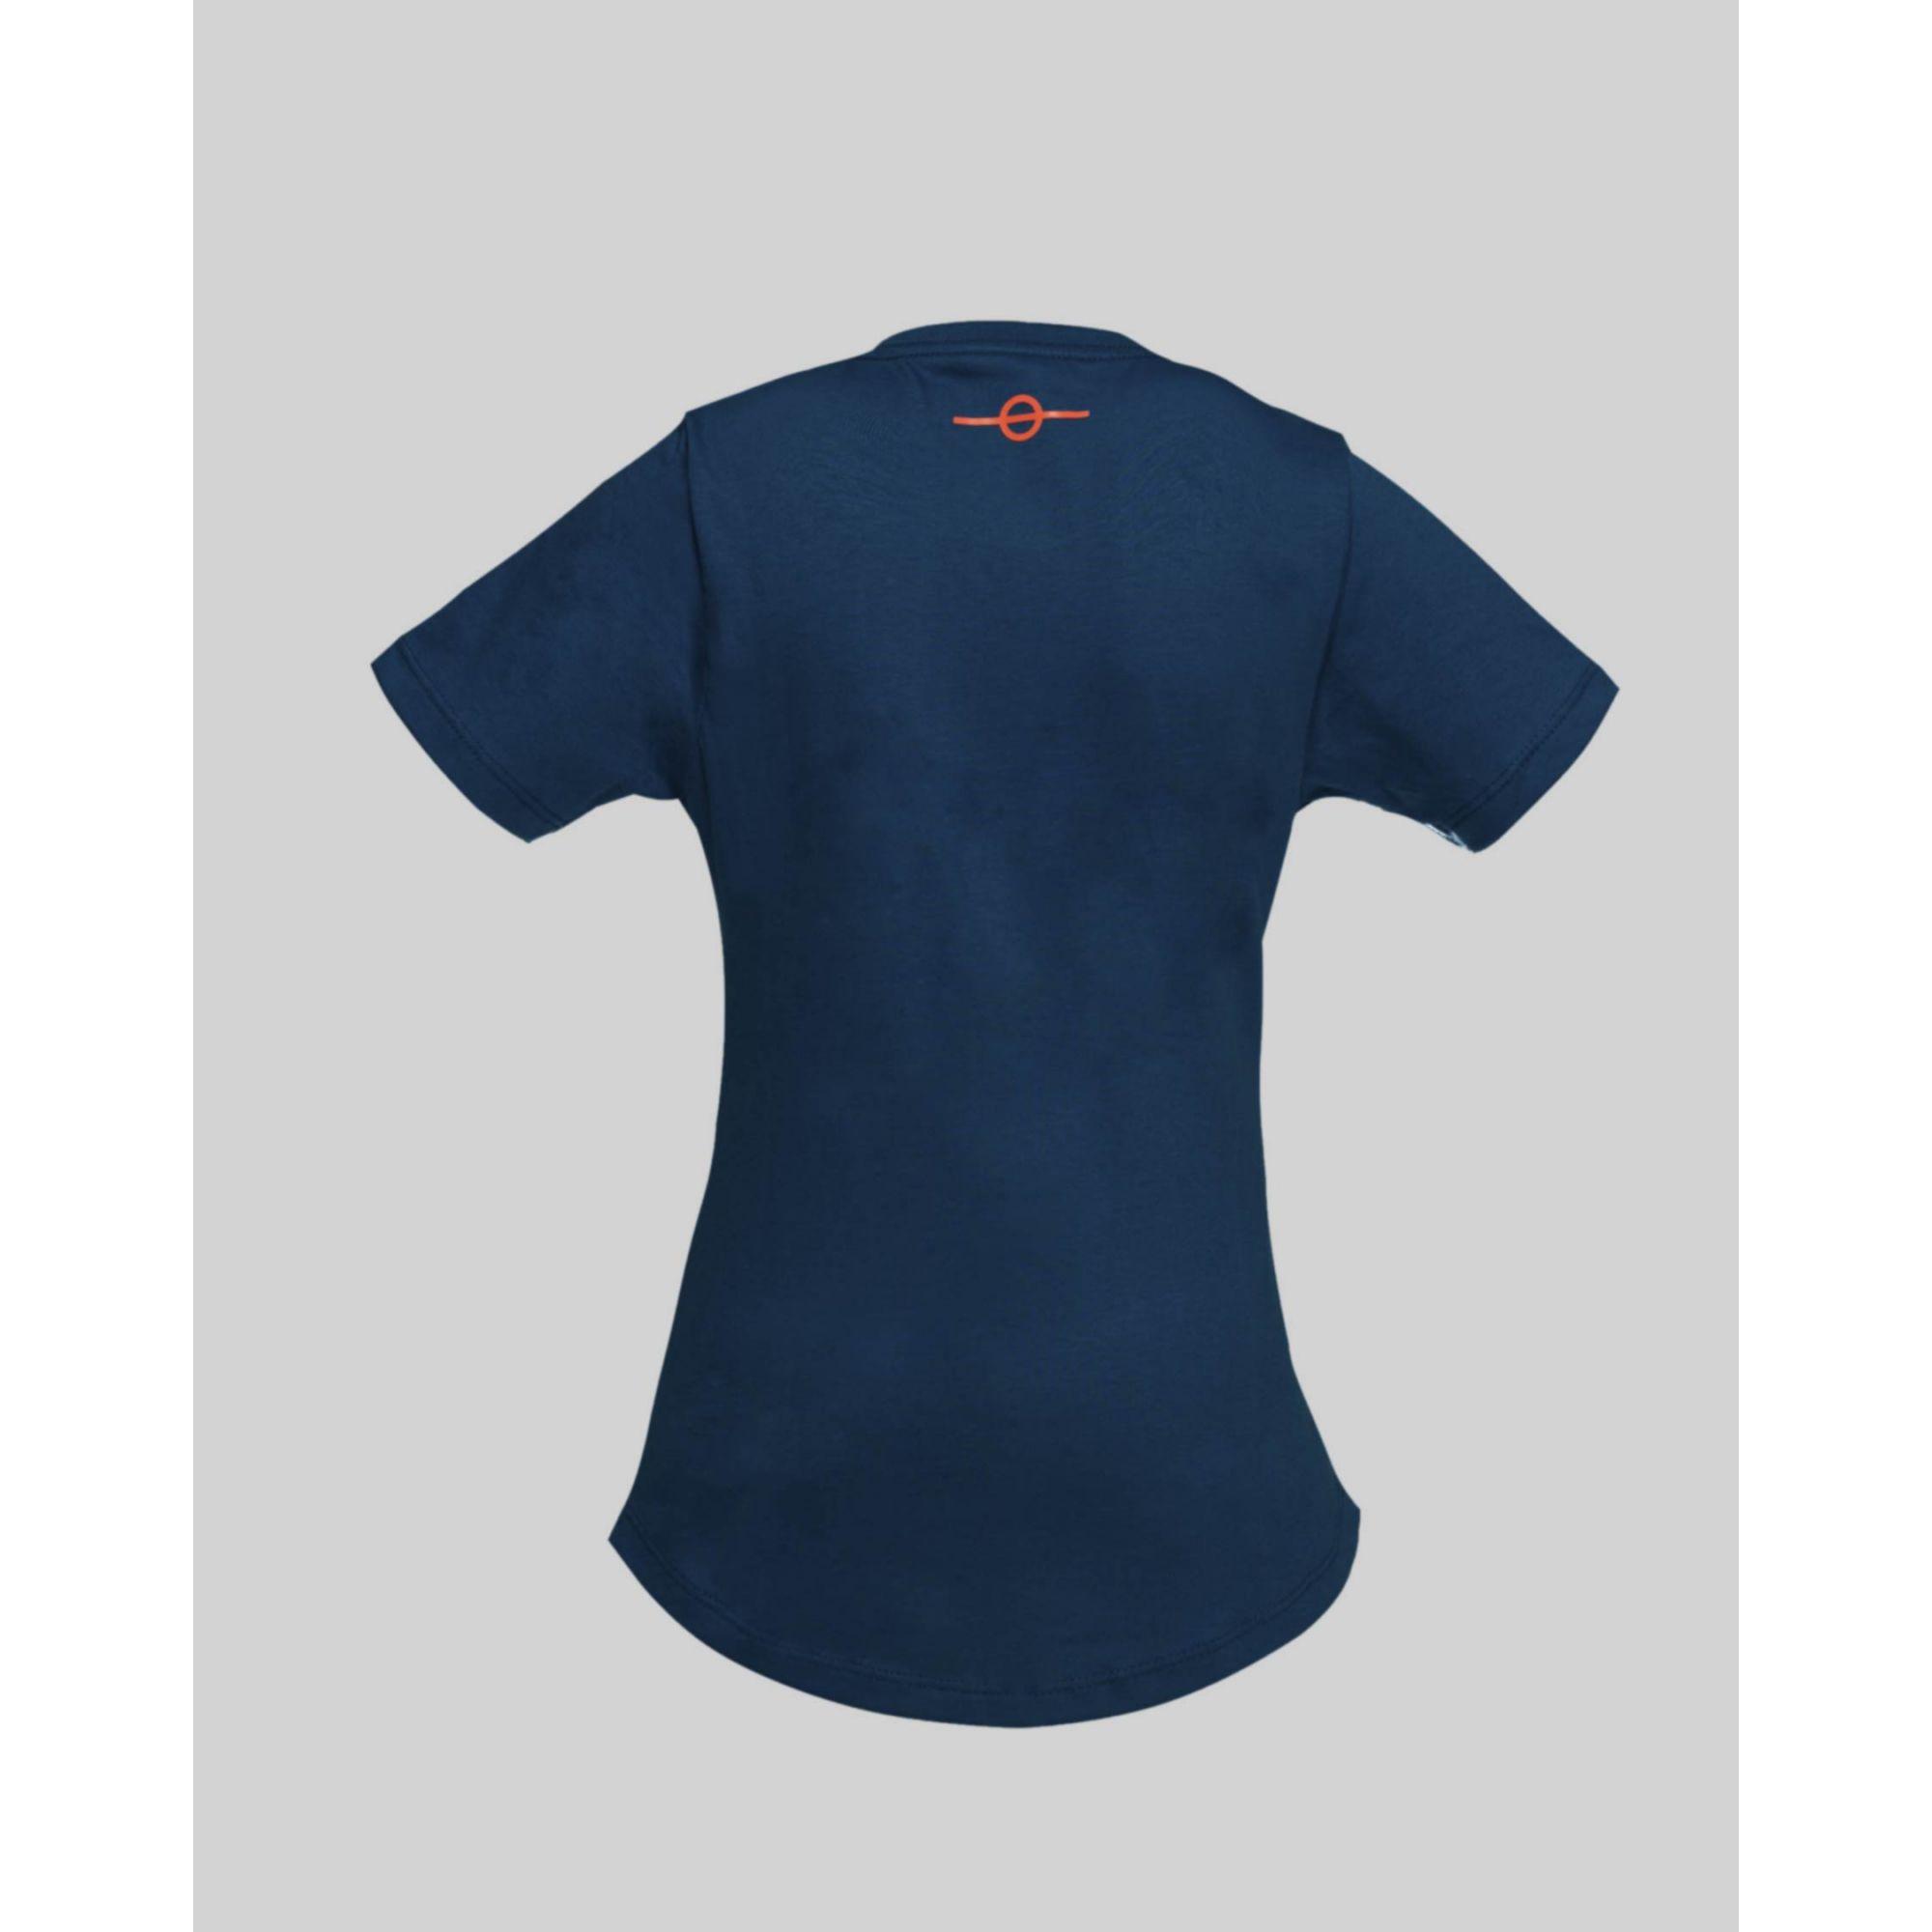 Camiseta Buh Kids Fluor Square Blue